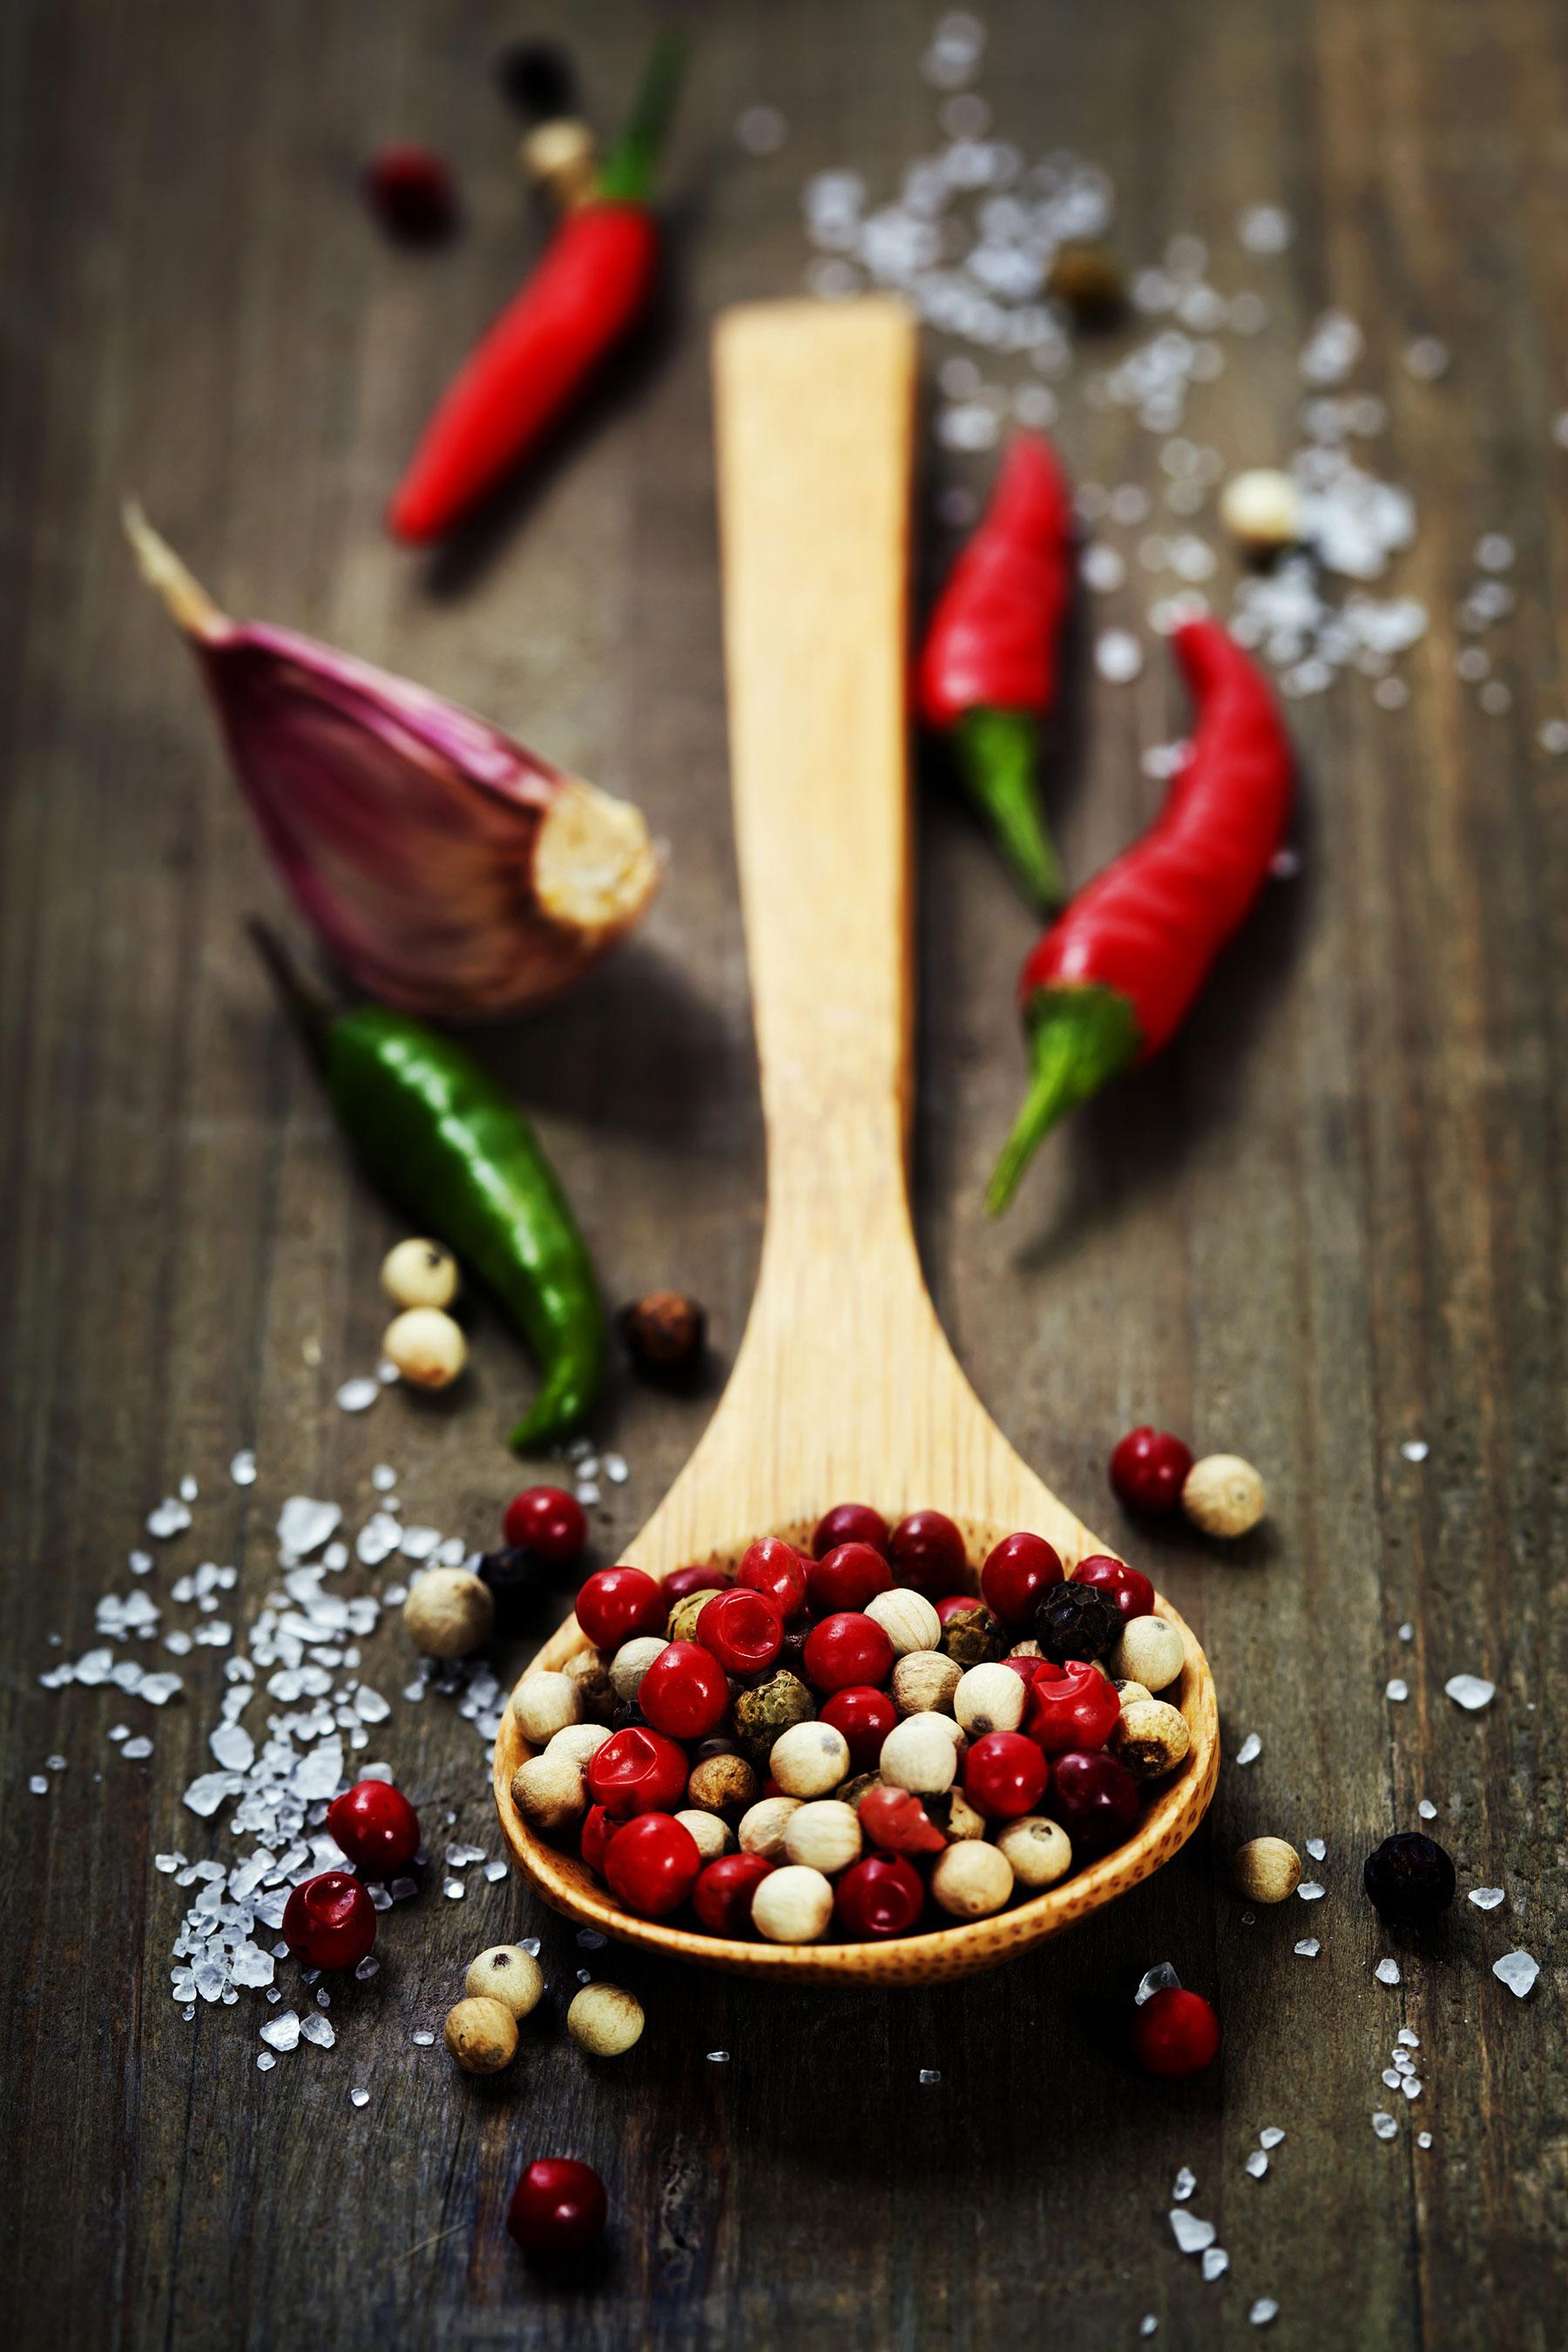 Takeaway spice Bayleaf N20